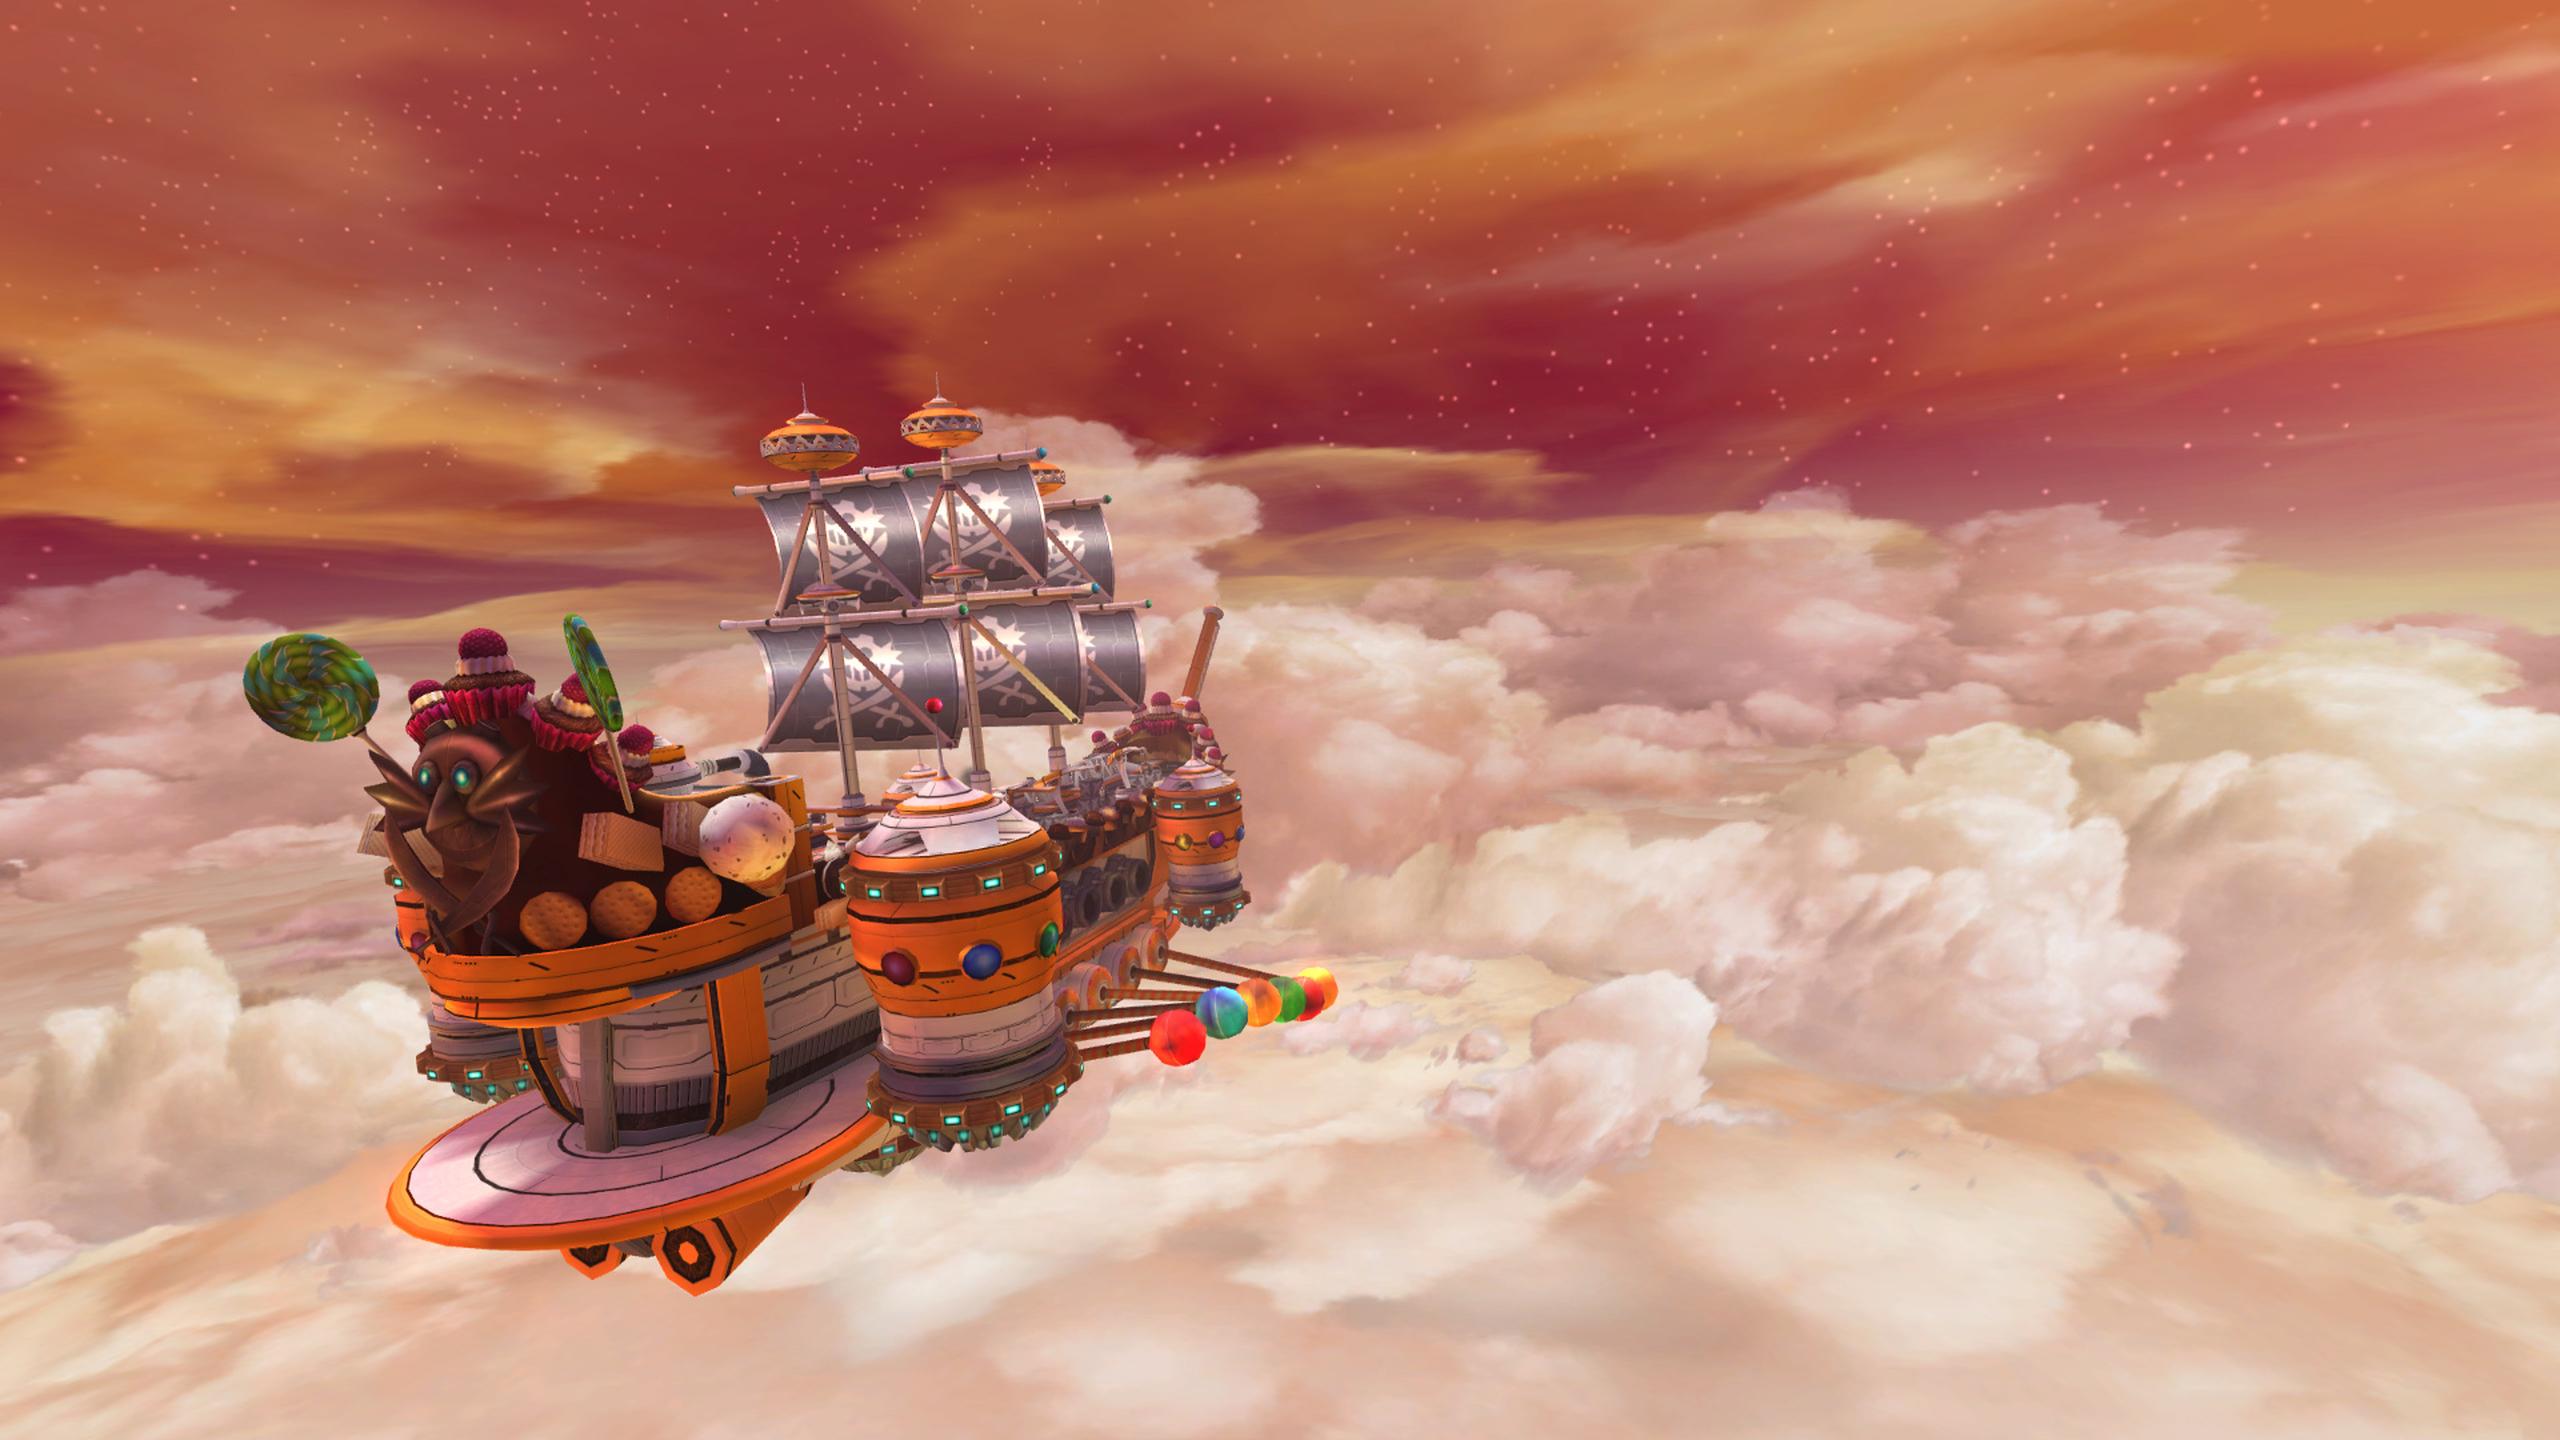 sweet-mountain-high-resolution-screen-3